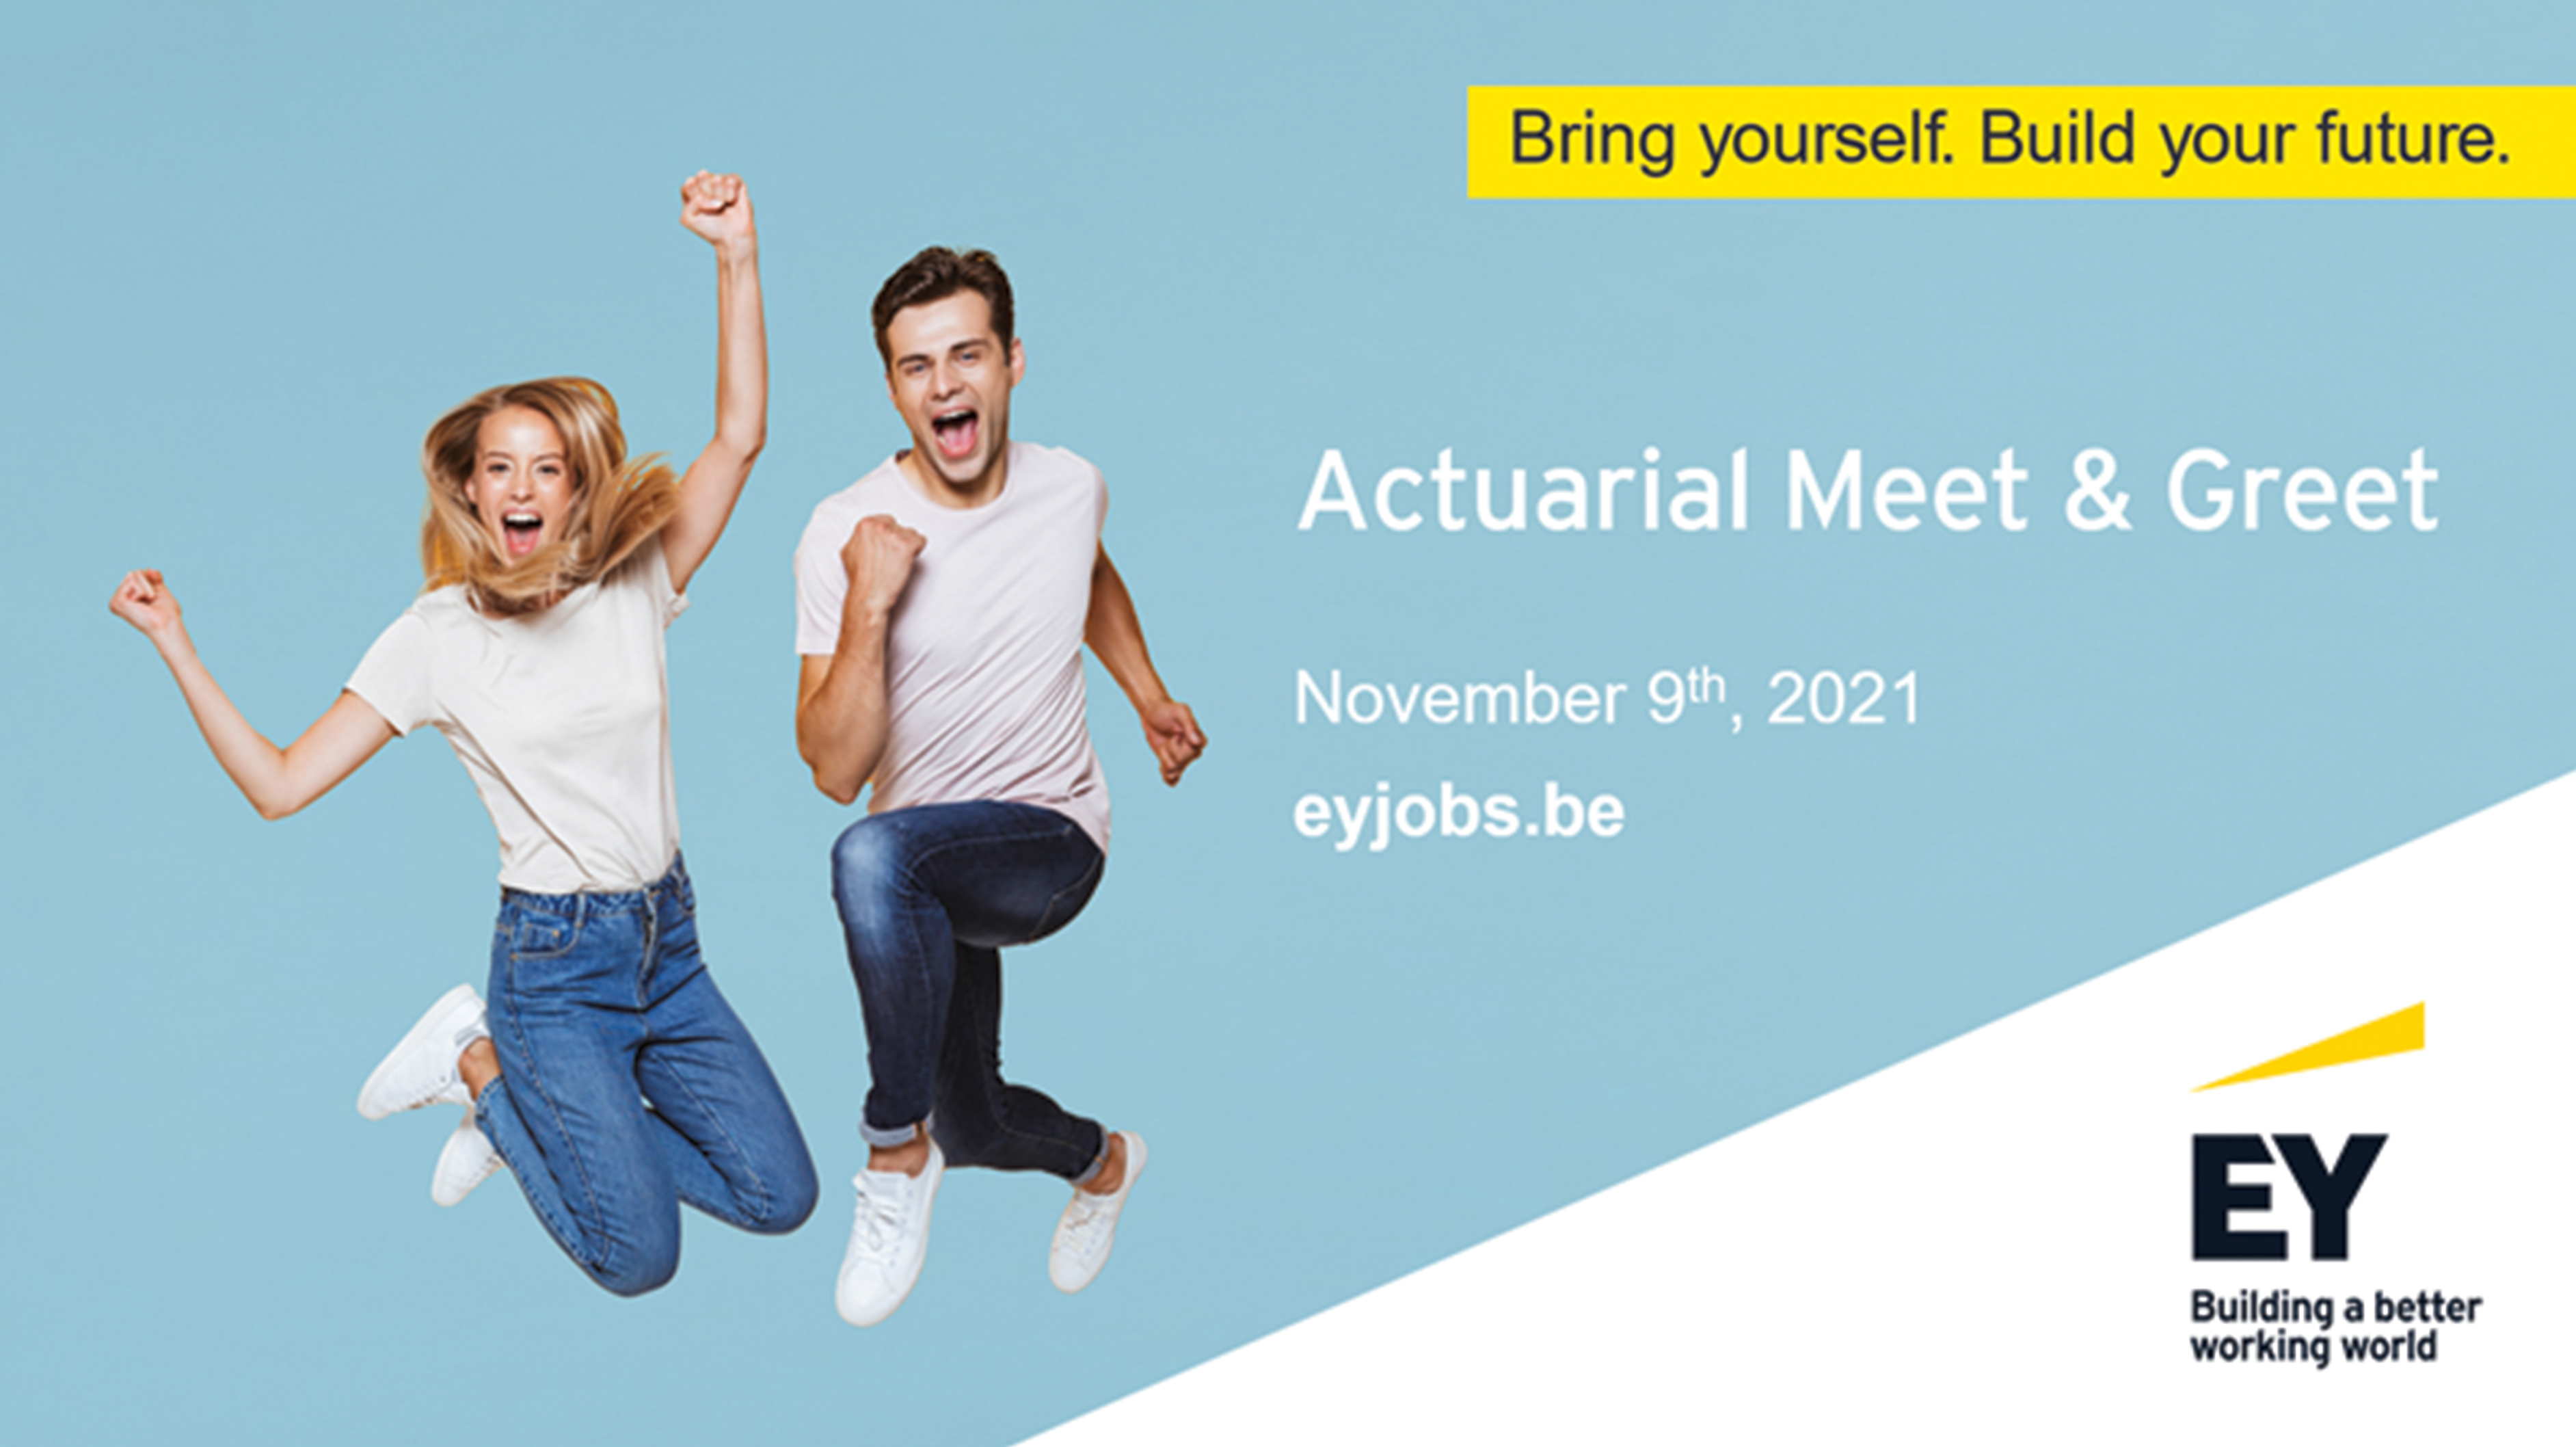 Actuarial Meet & Greet